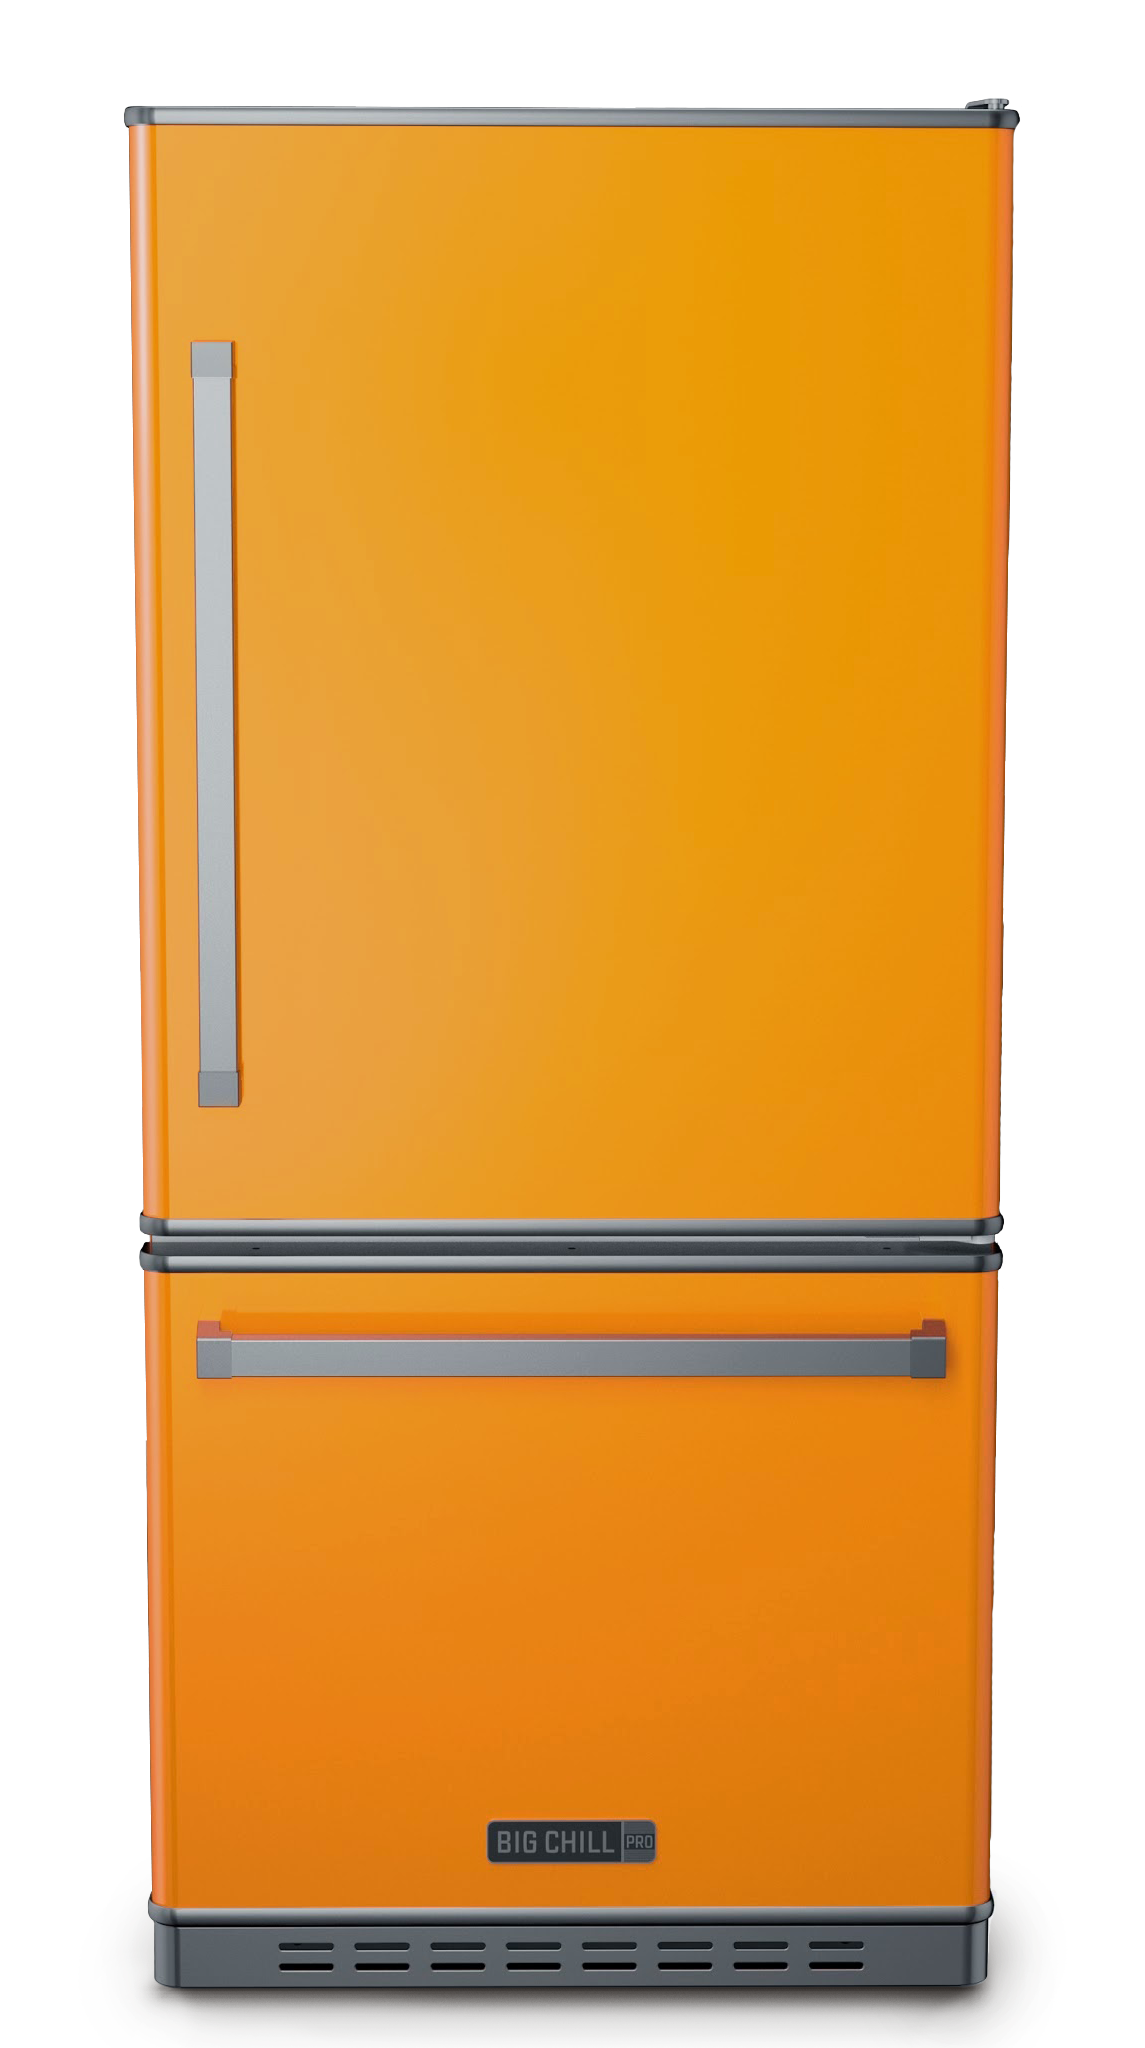 Refrigerator png images free. Fridge clipart fride